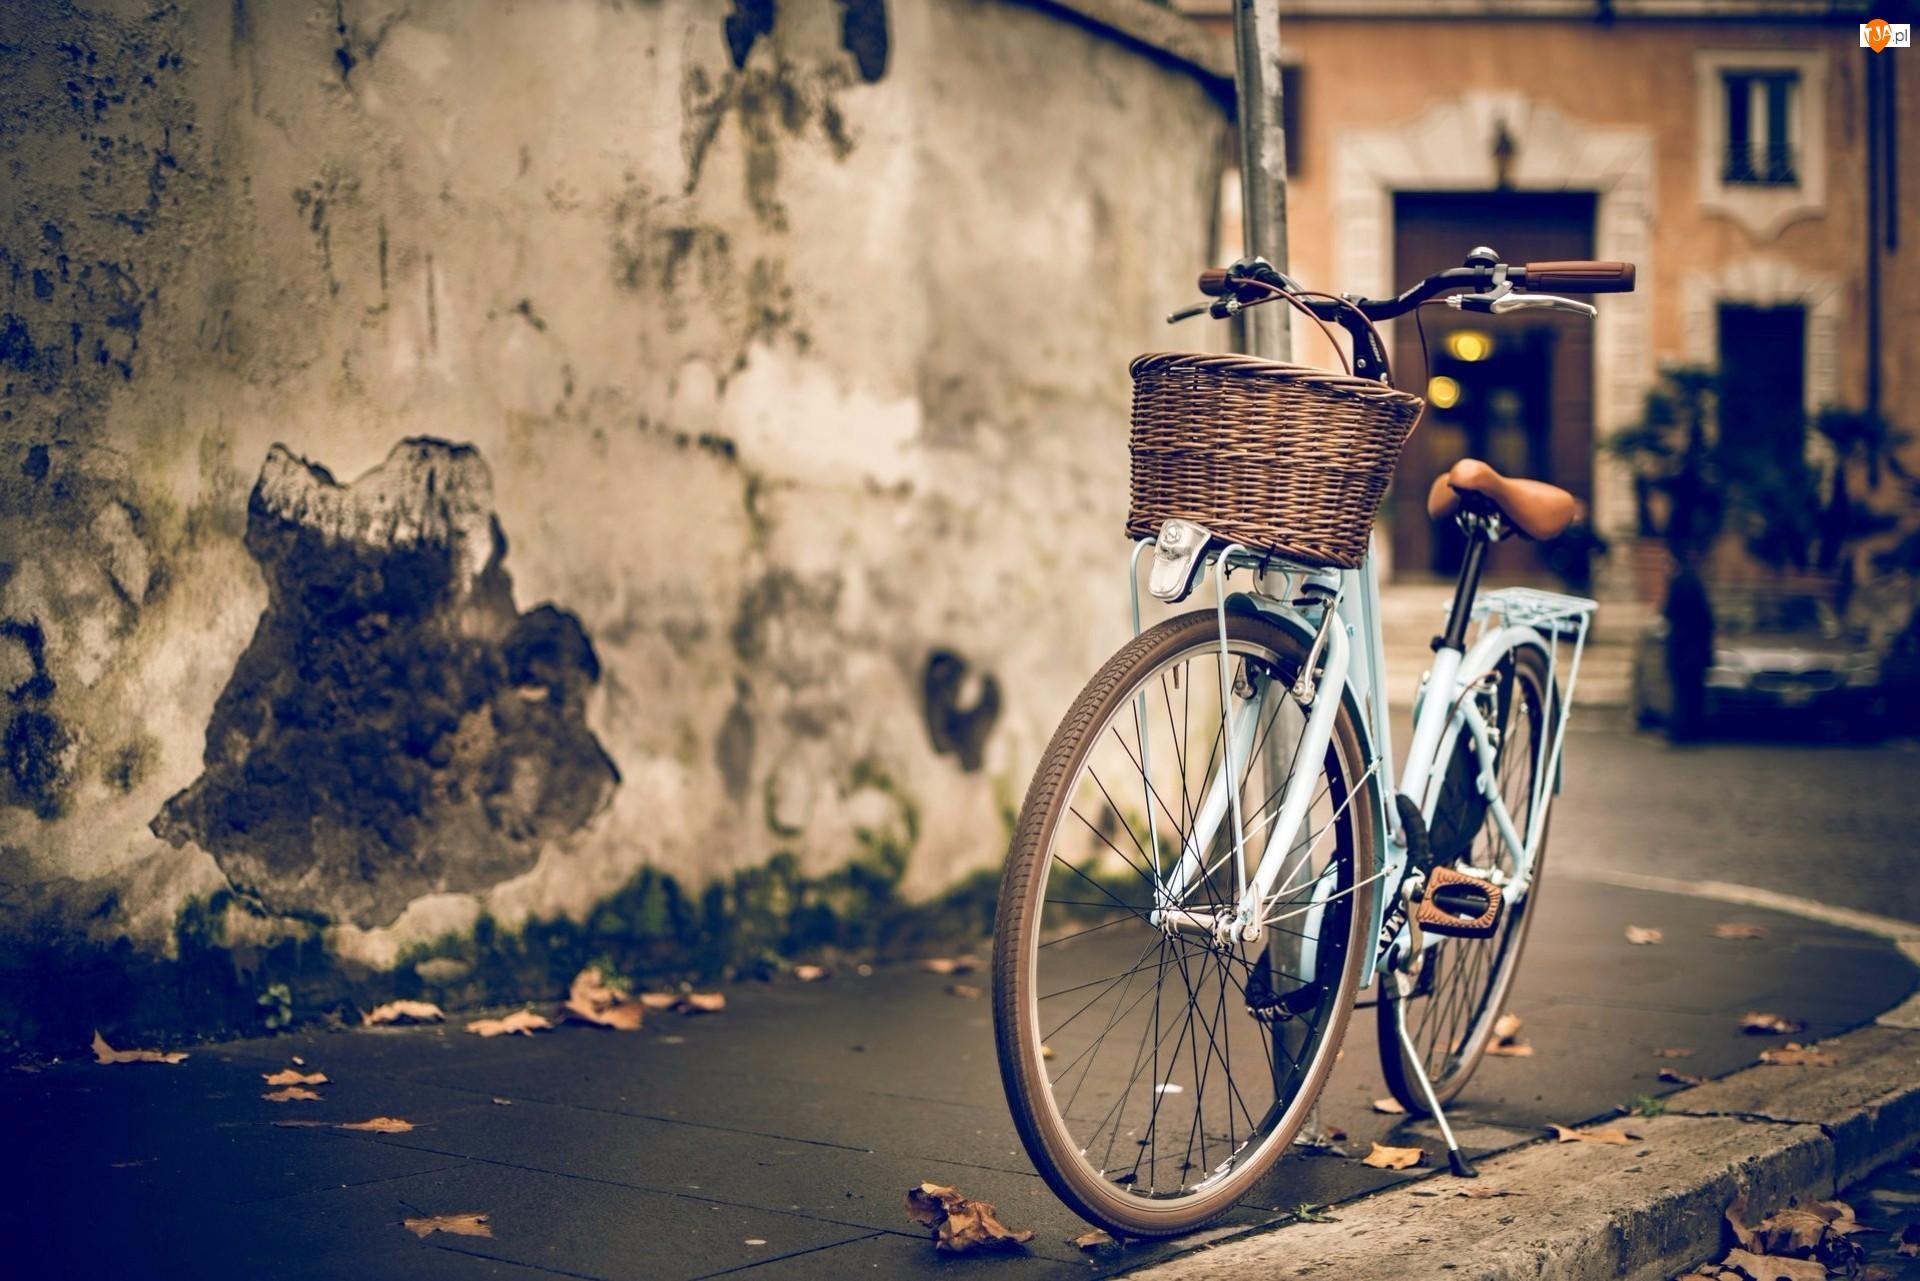 Chodnik, Rower, Ulica